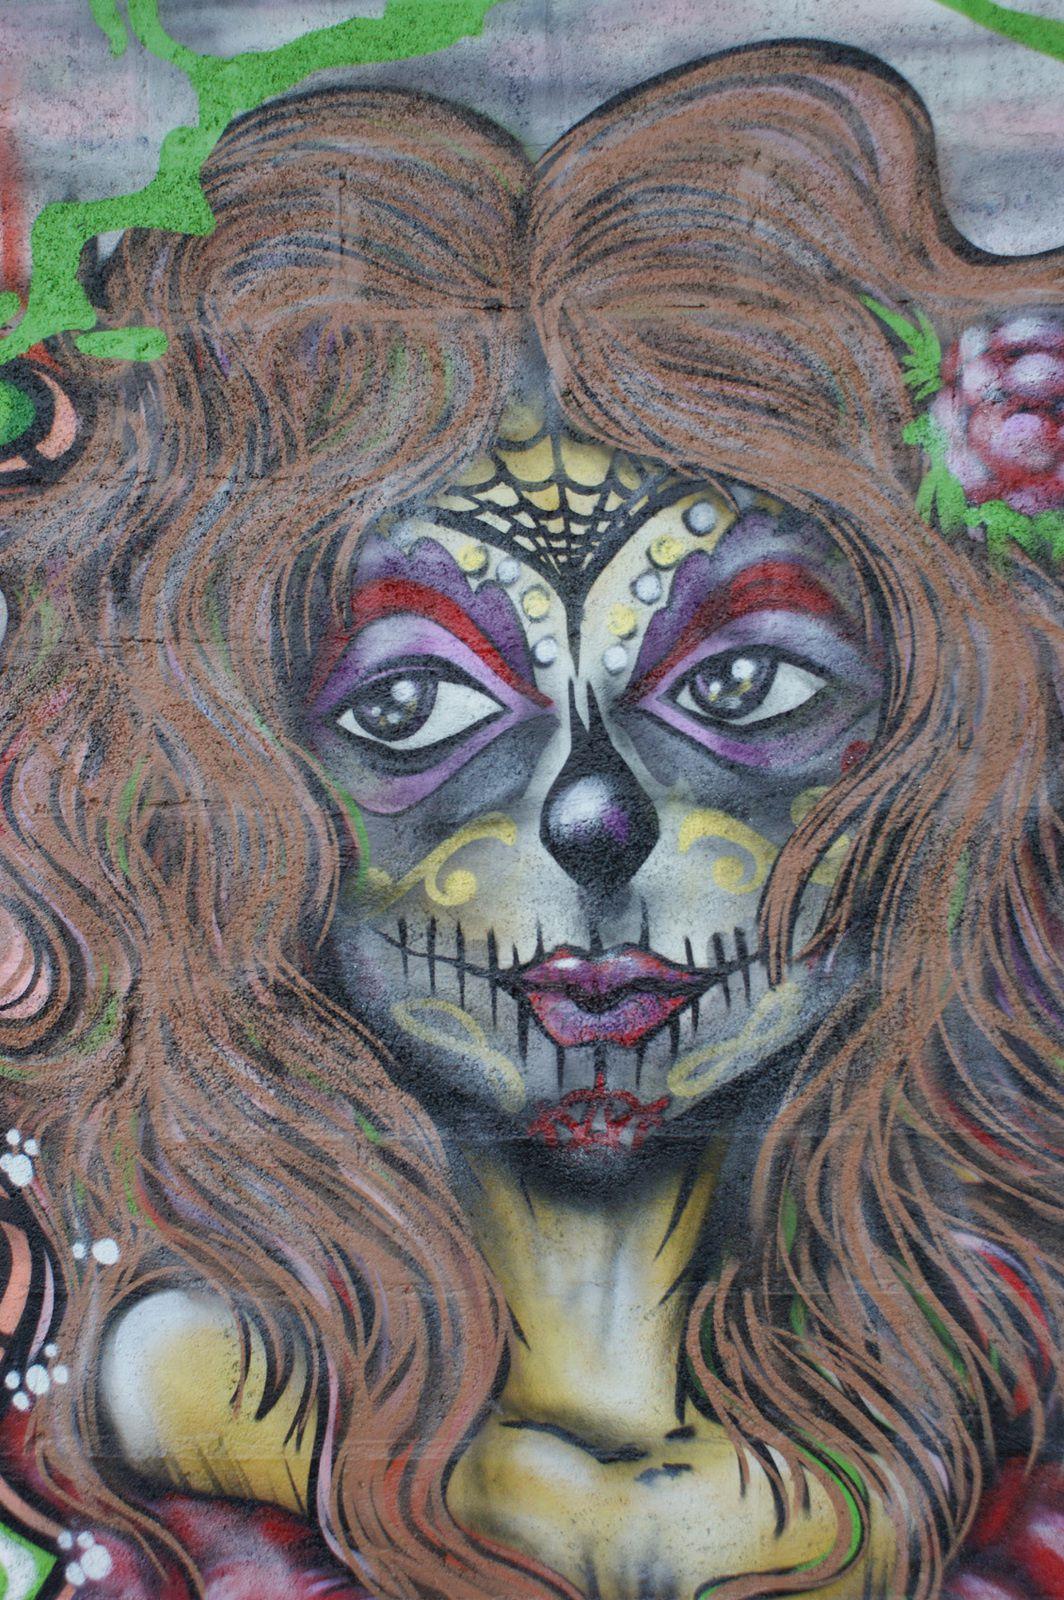 Street Art : Graffitis & Fresques Murales Département Yvelines (78)